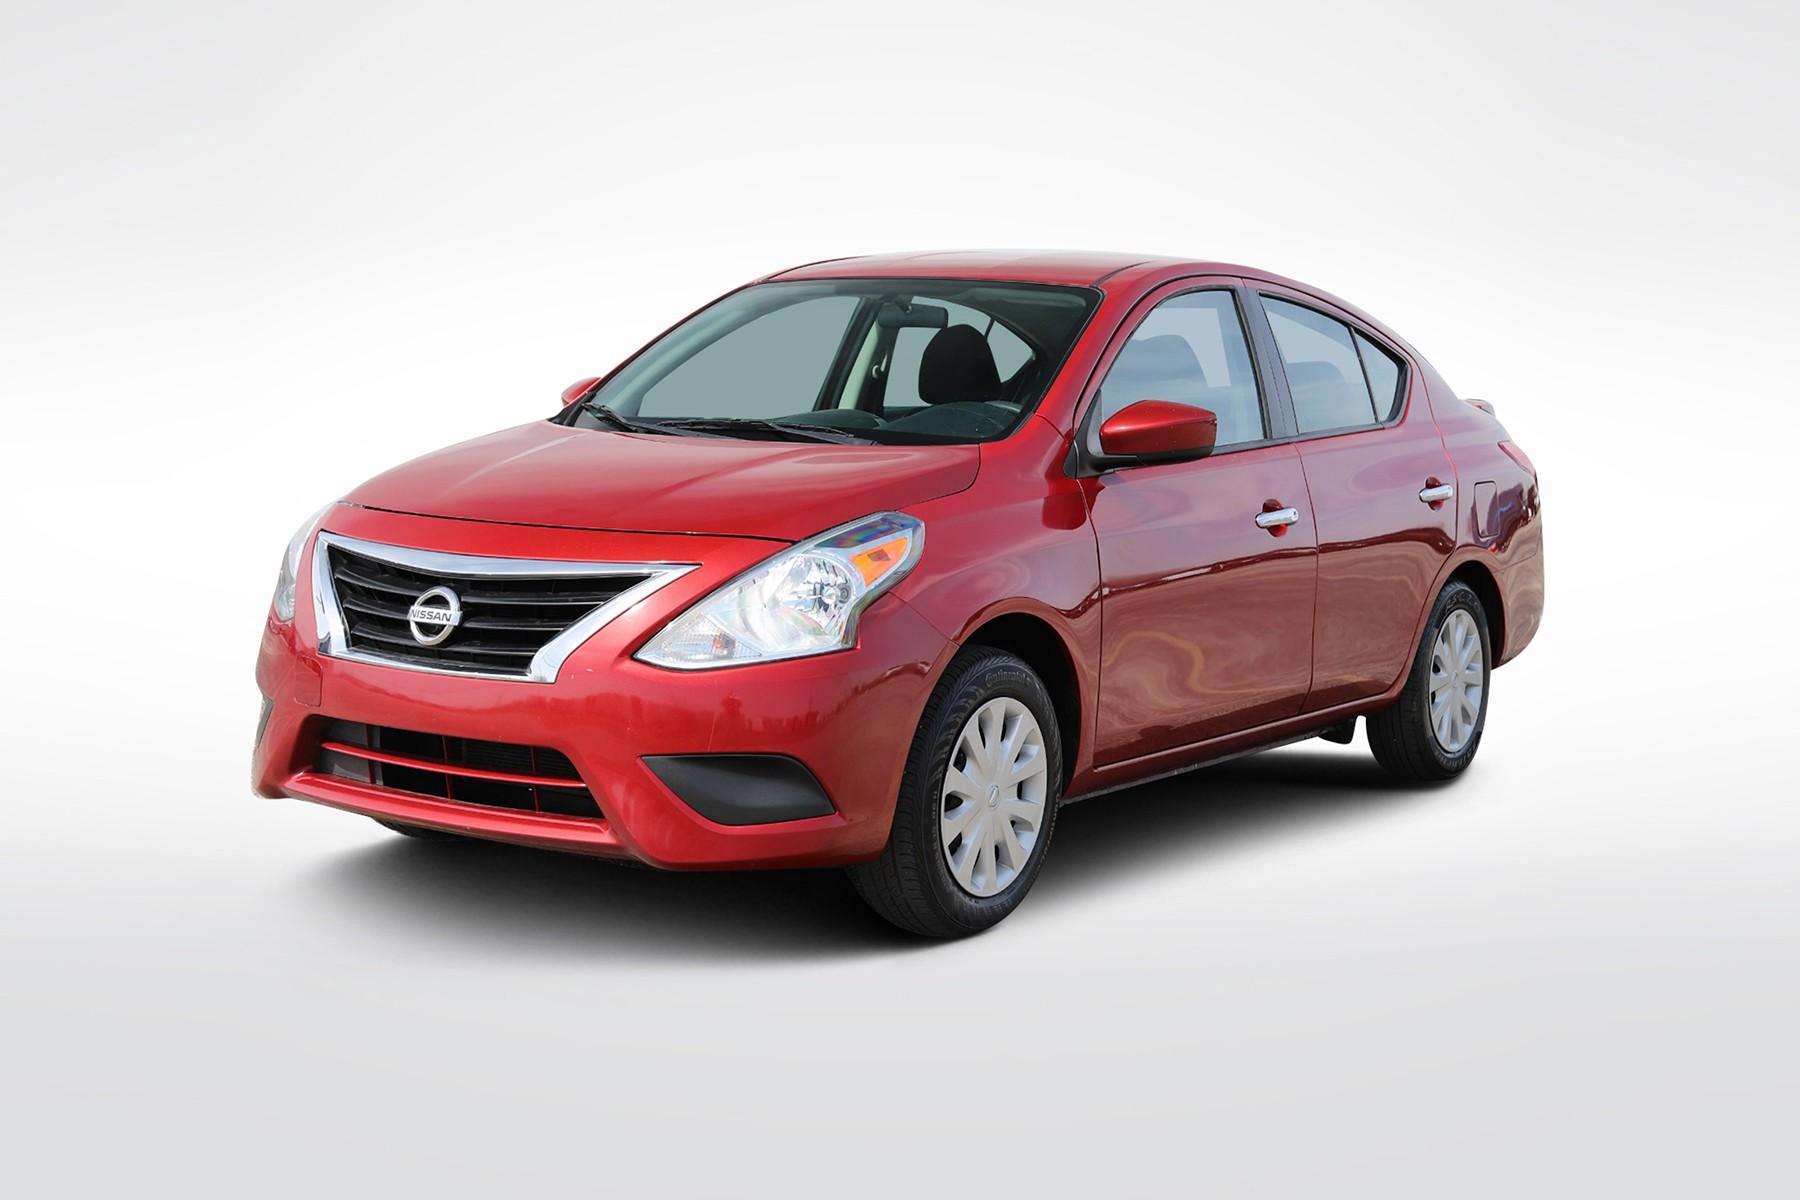 2017 Nissan Versa SV (from $9,400)